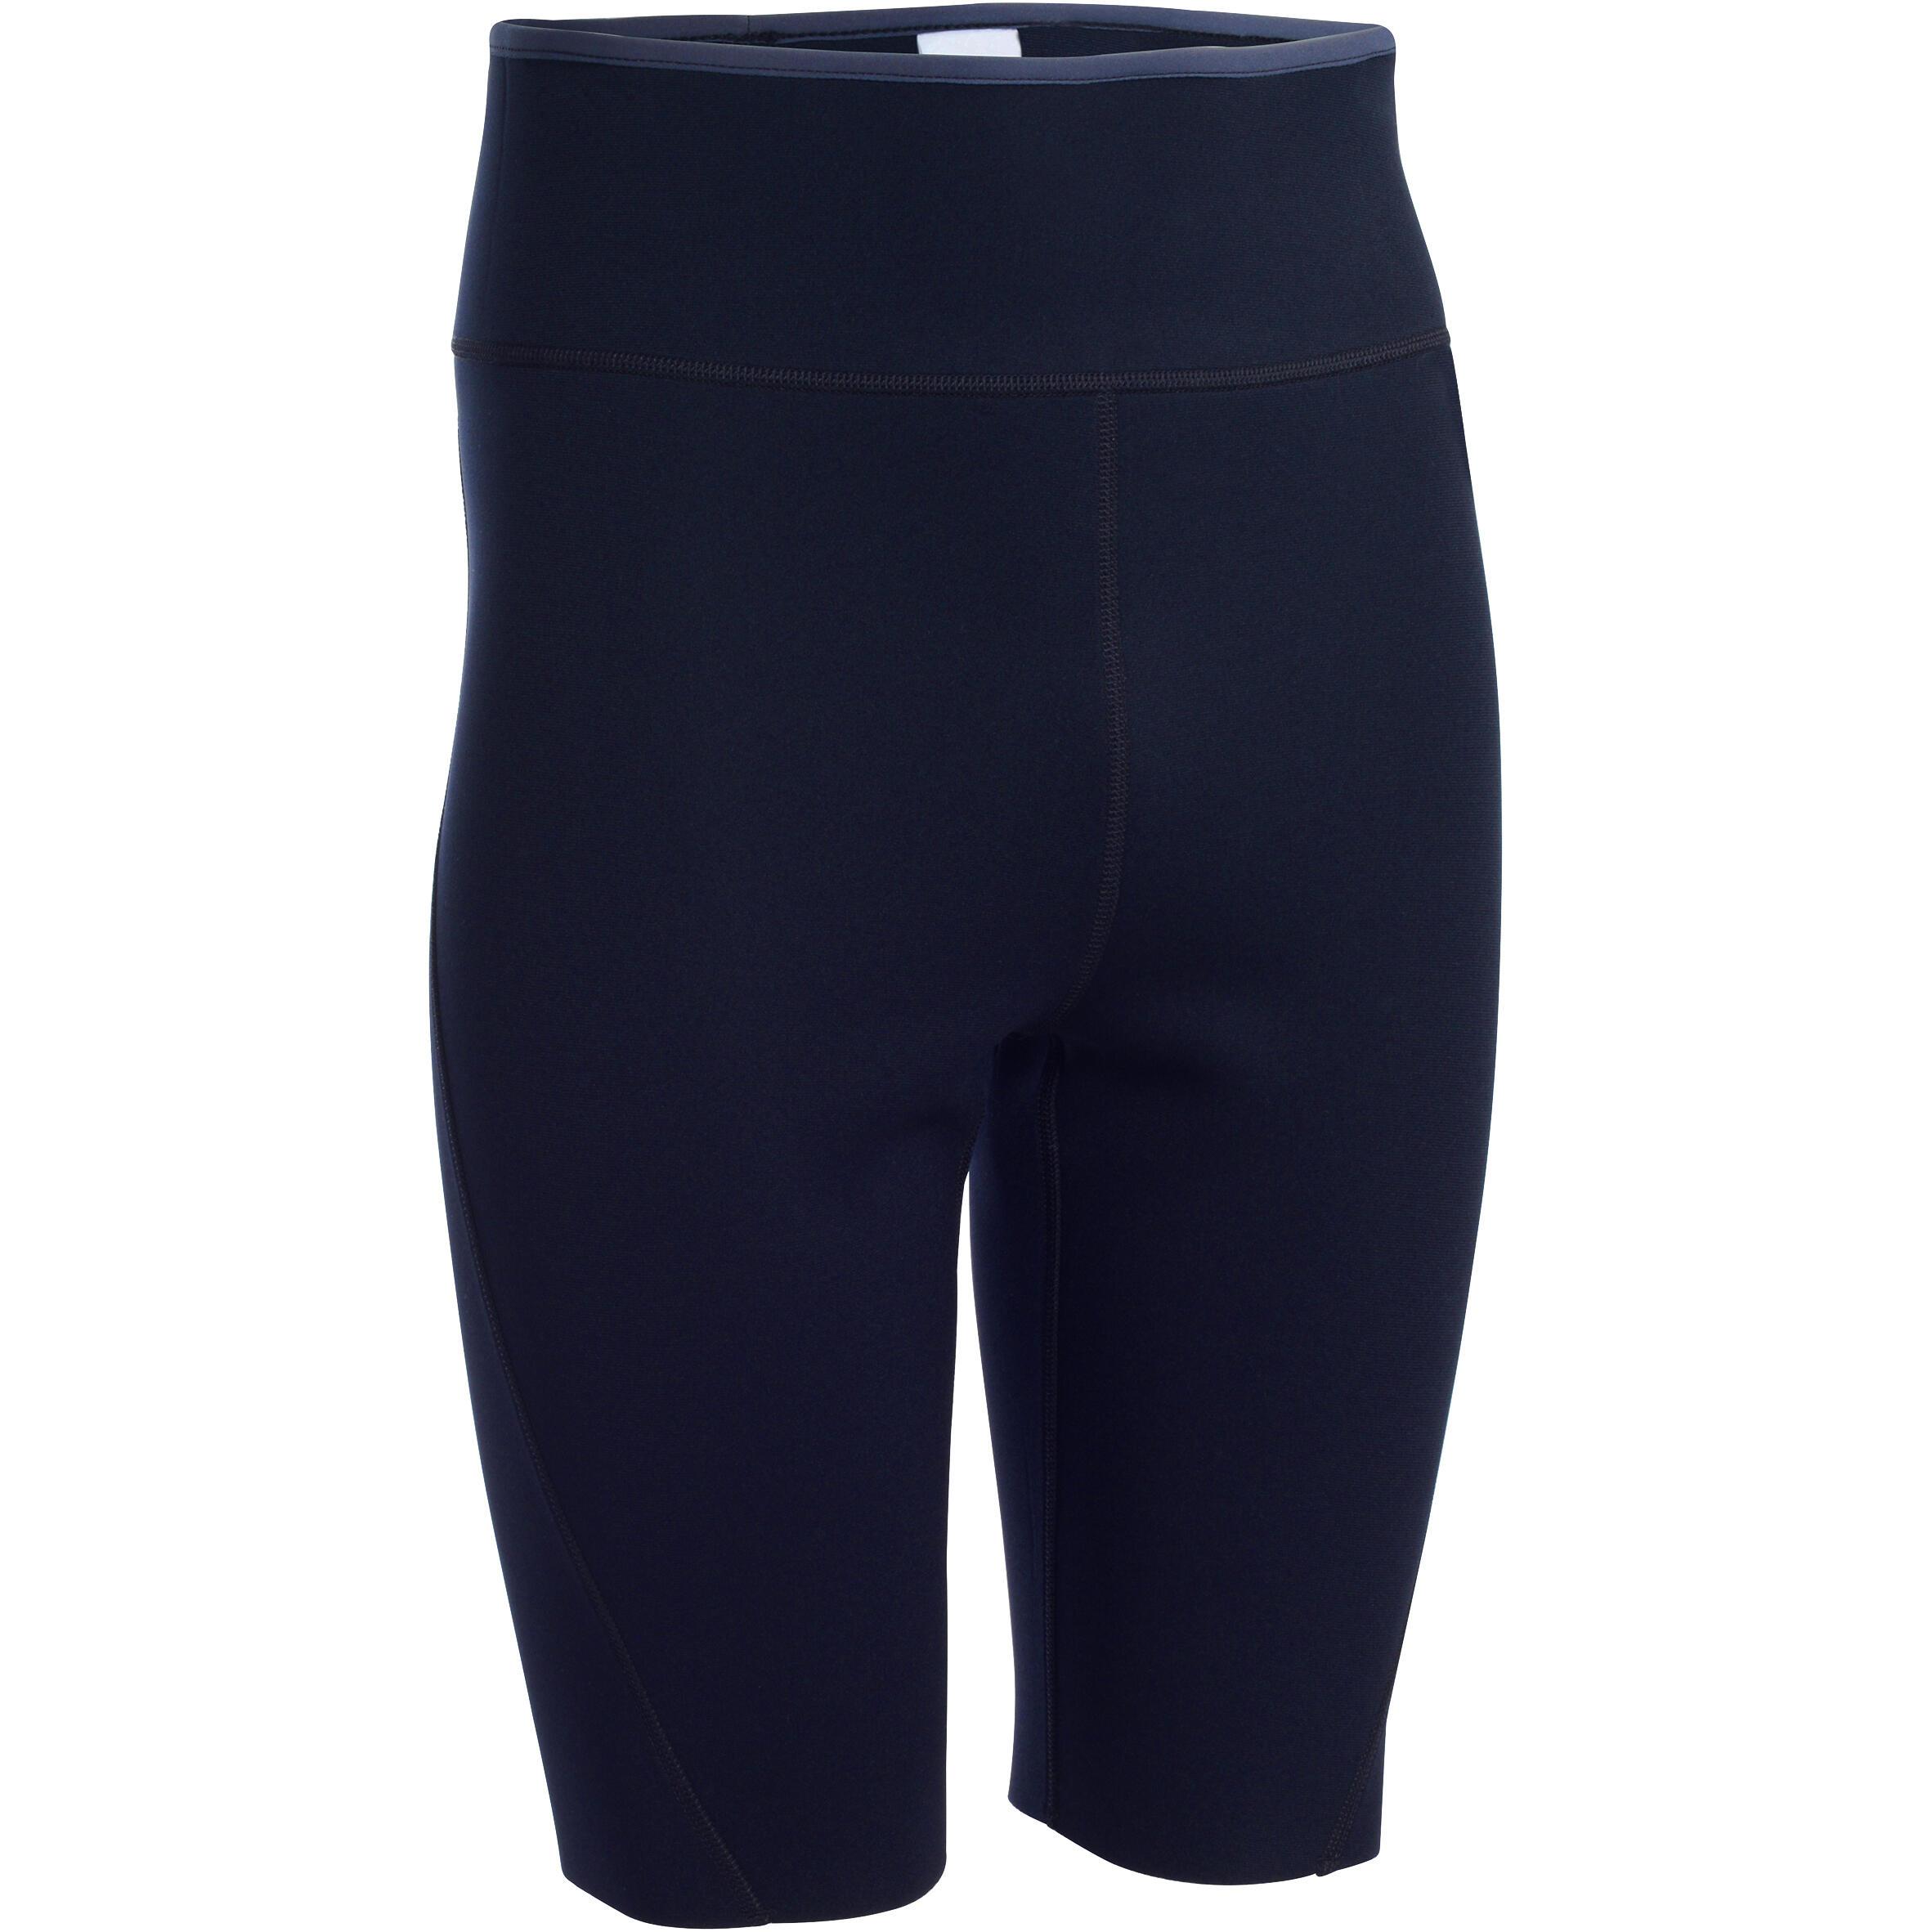 Cardio Fitness Sweat Shorts...